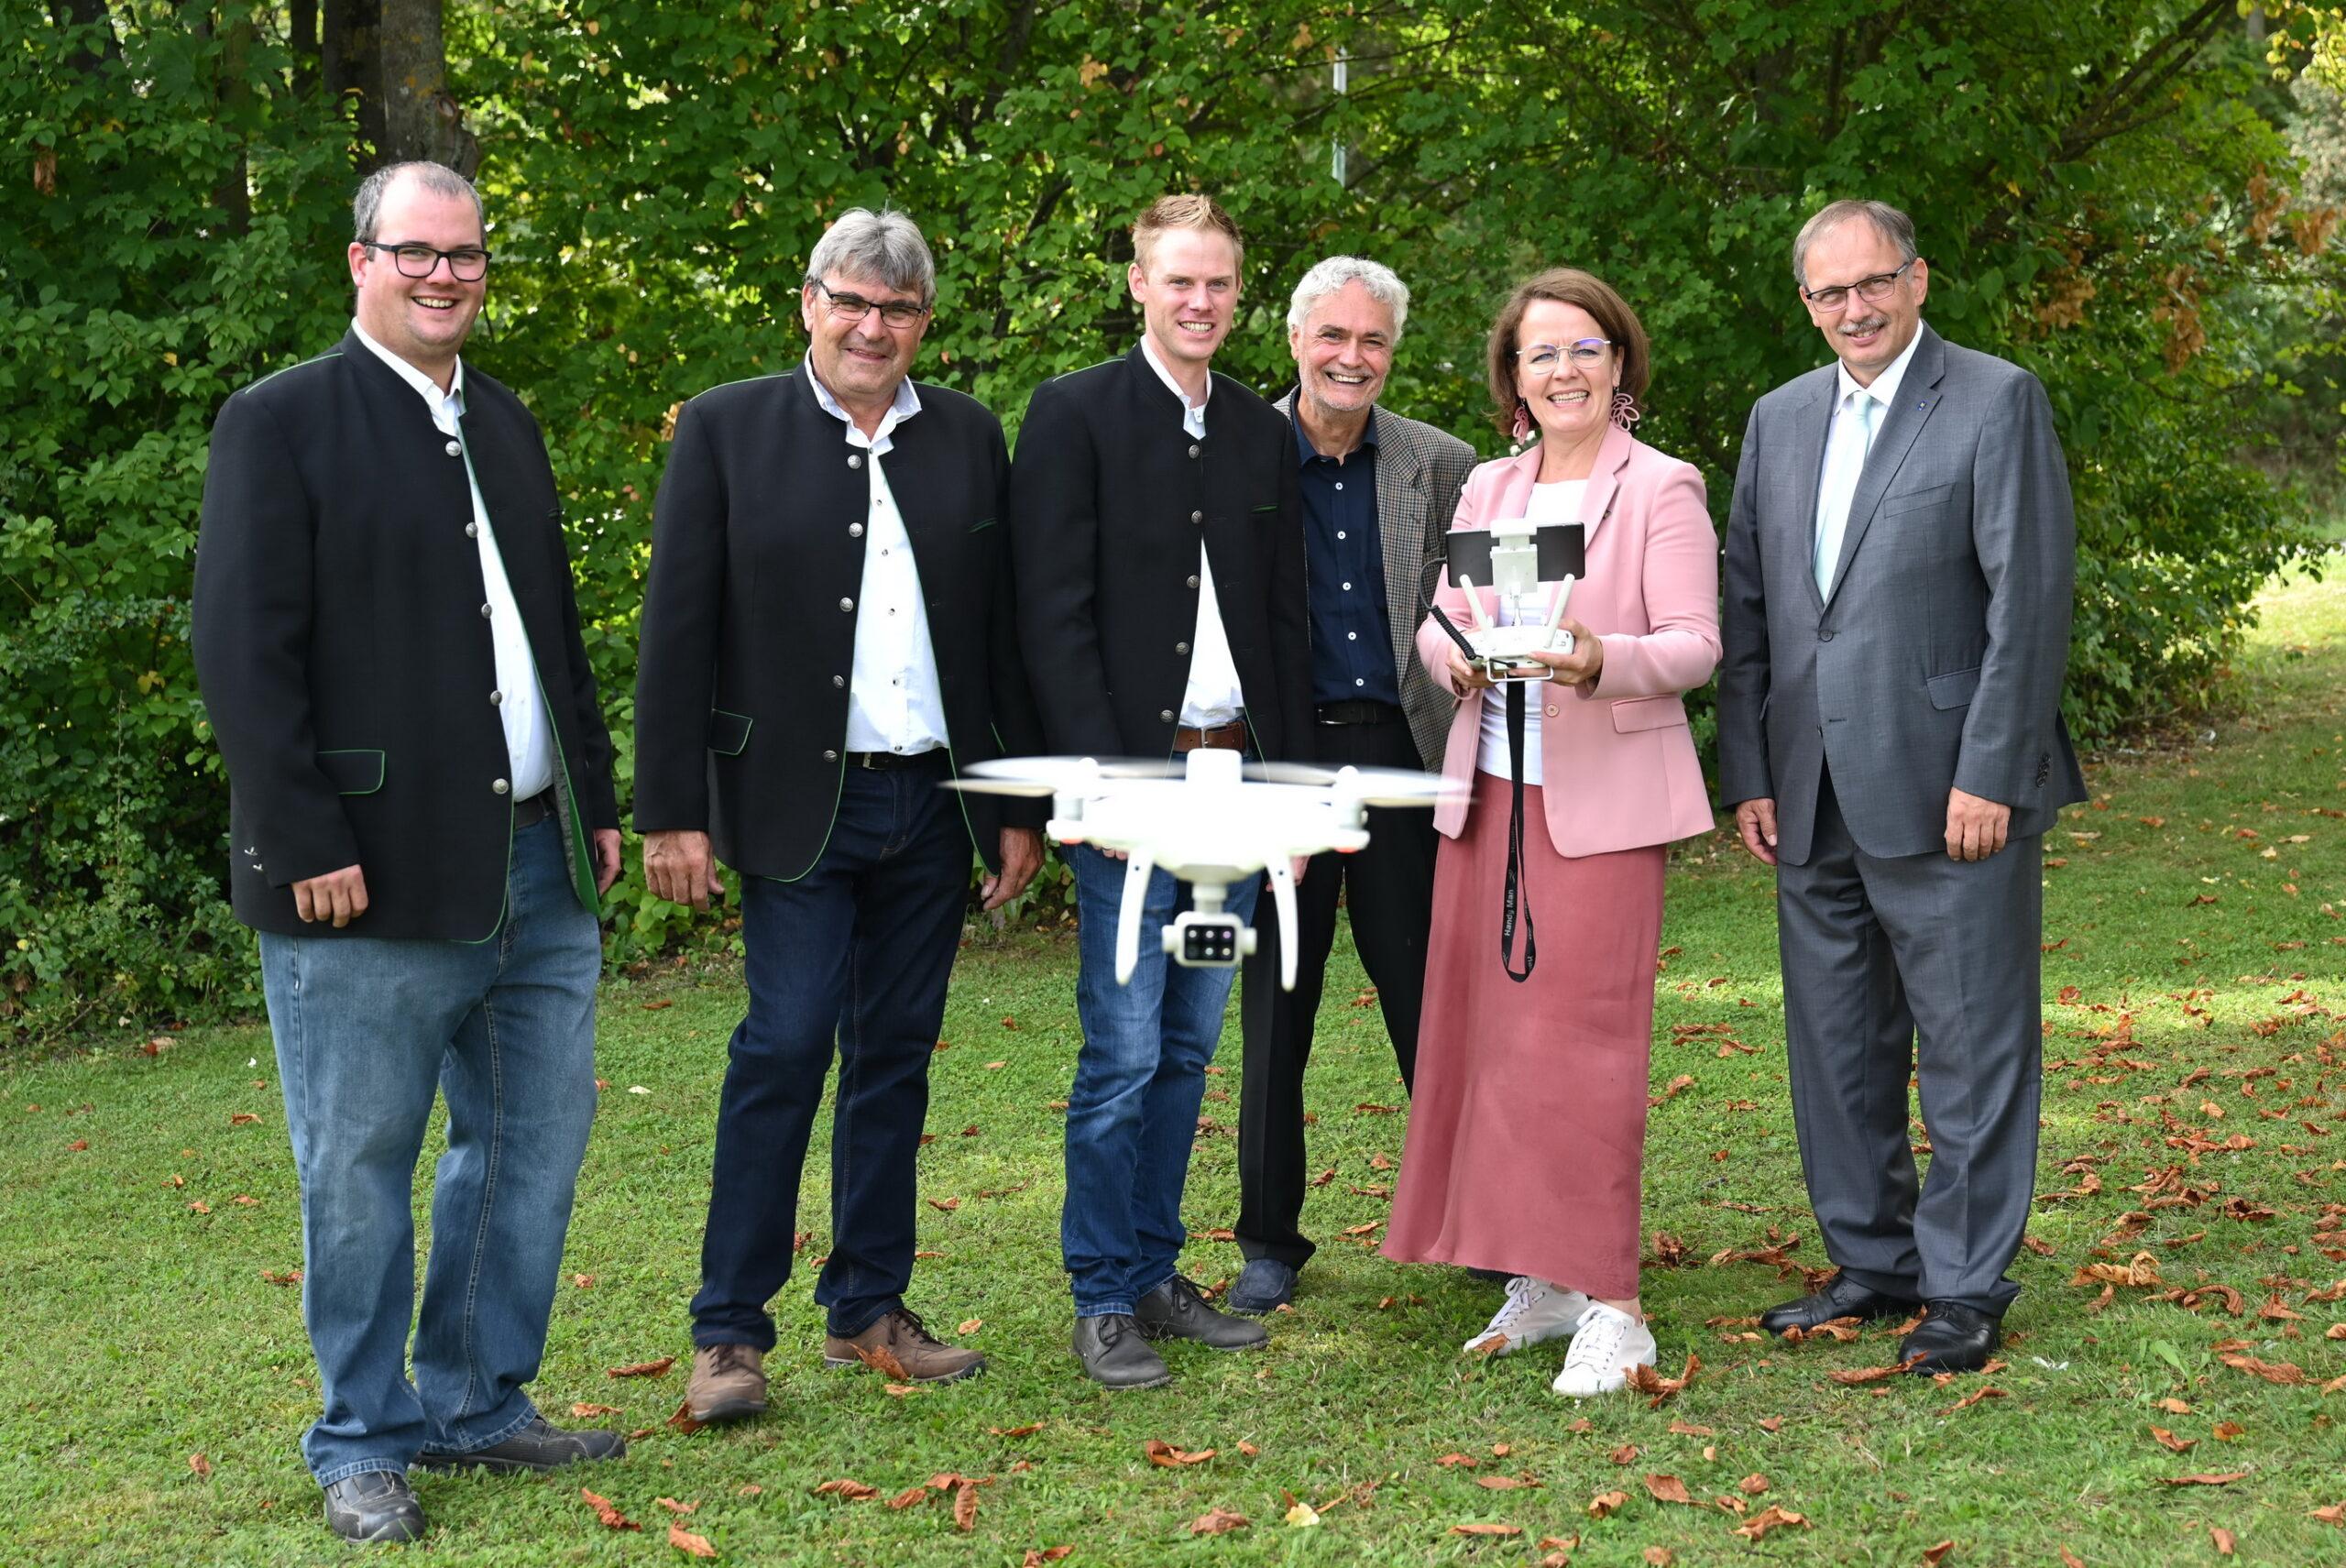 Hollabrunn Drohne+Kamera2-21 Copyright Jürgen Mück